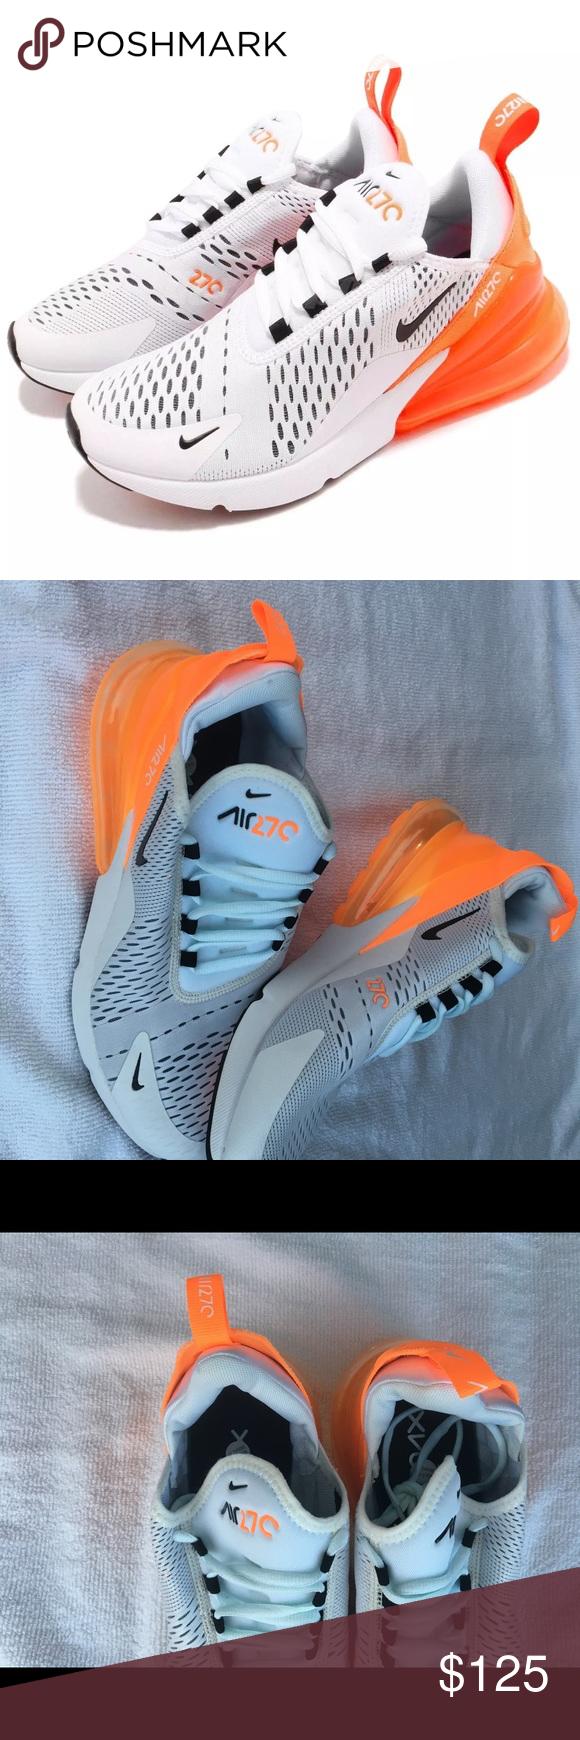 Nike Air Max 270 Women/'s Shoes AH6789-104 White//Black-Total Orange